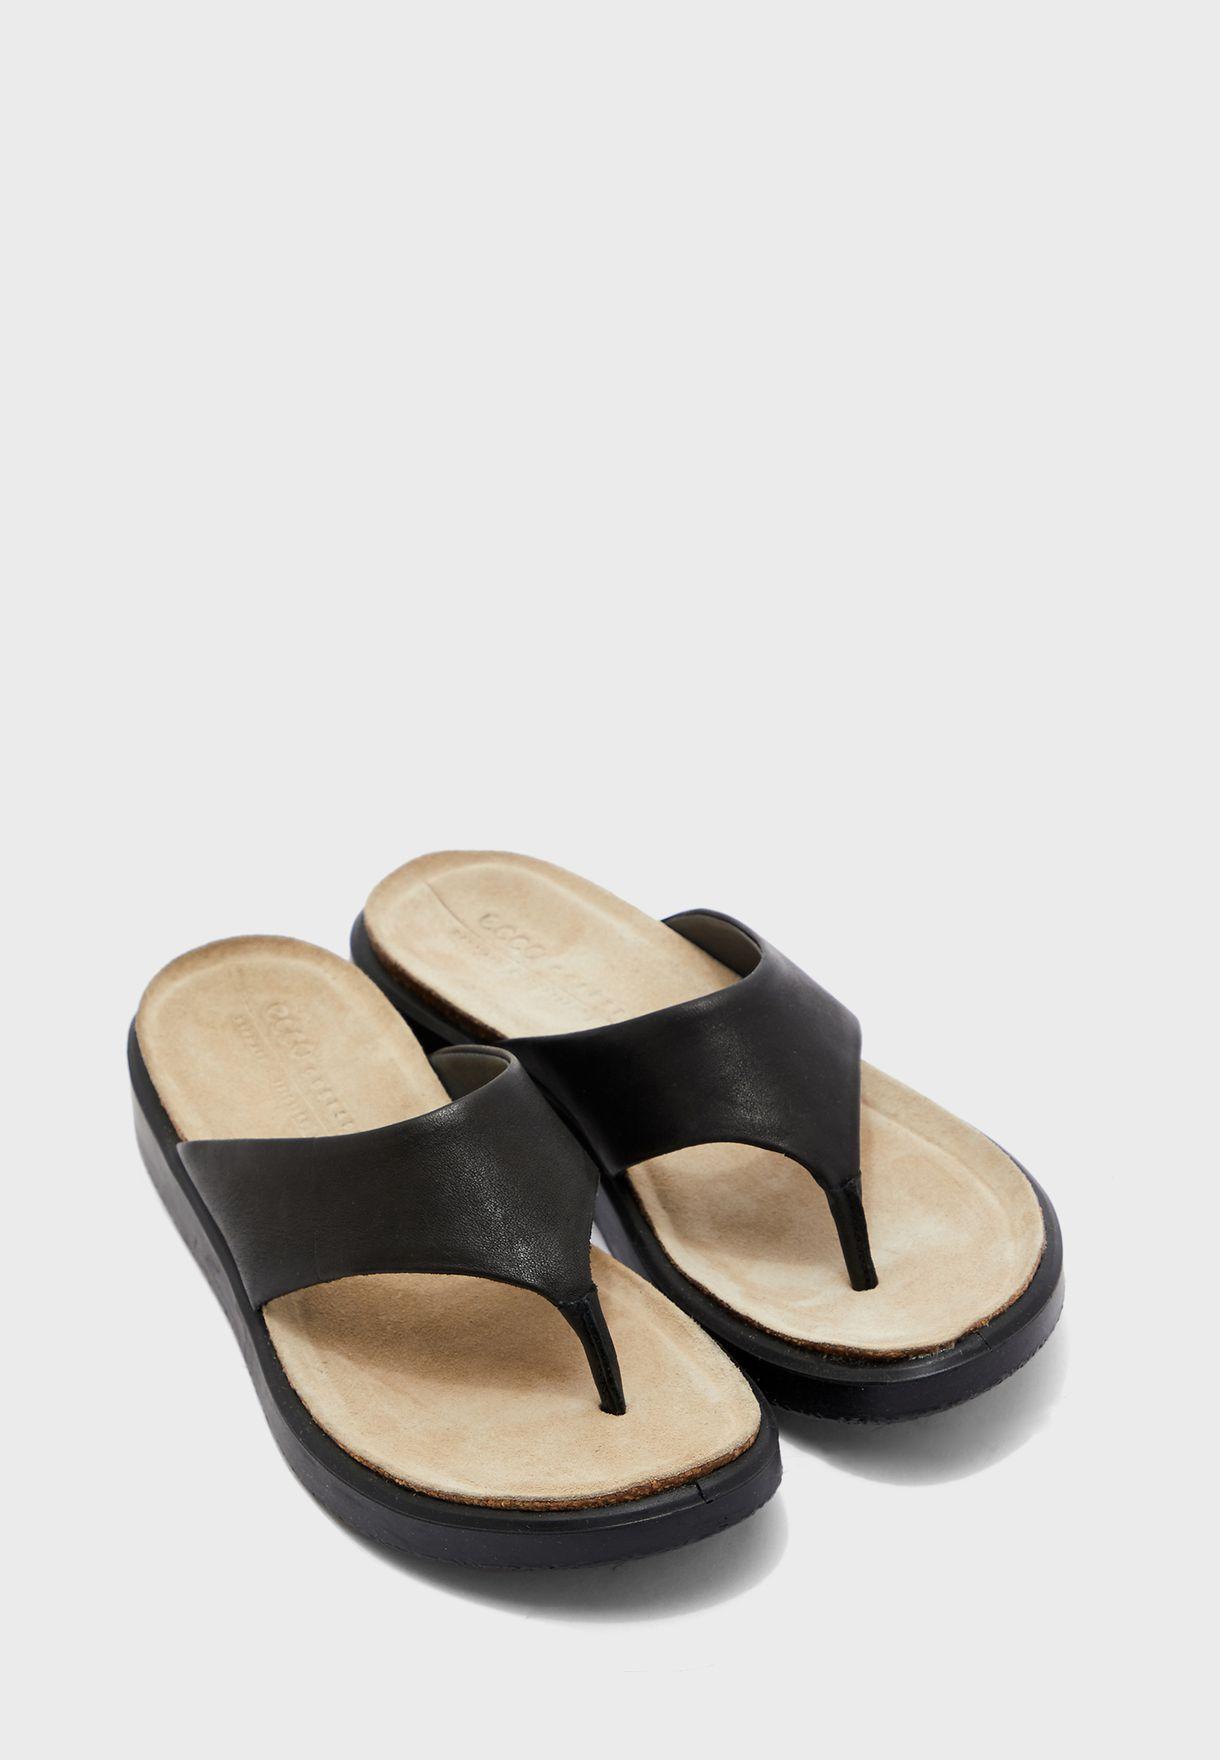 T-Shape Wedge Sandals